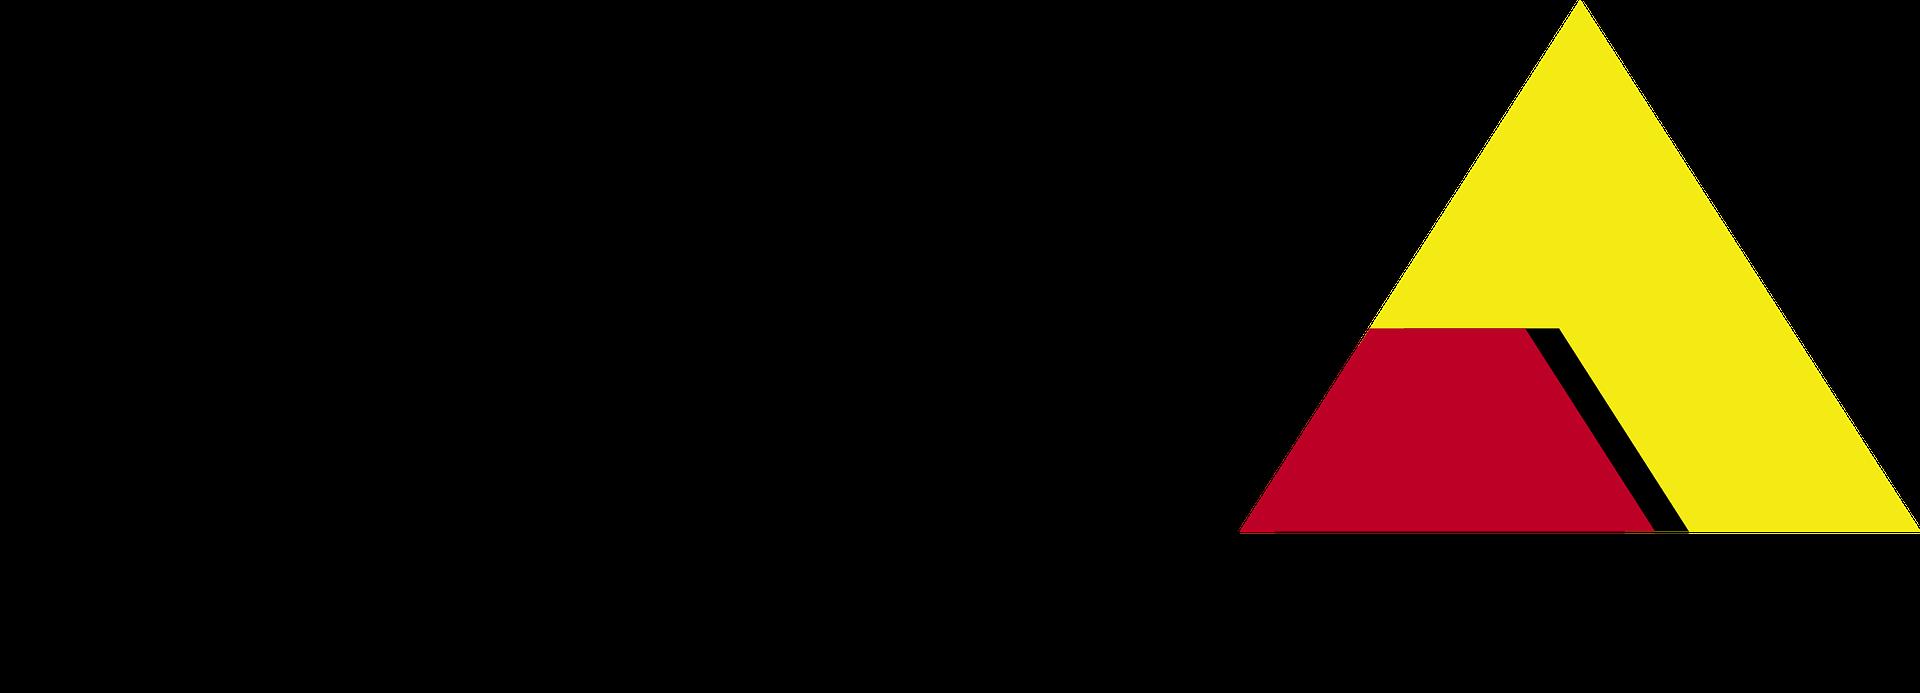 Axis Communications logo